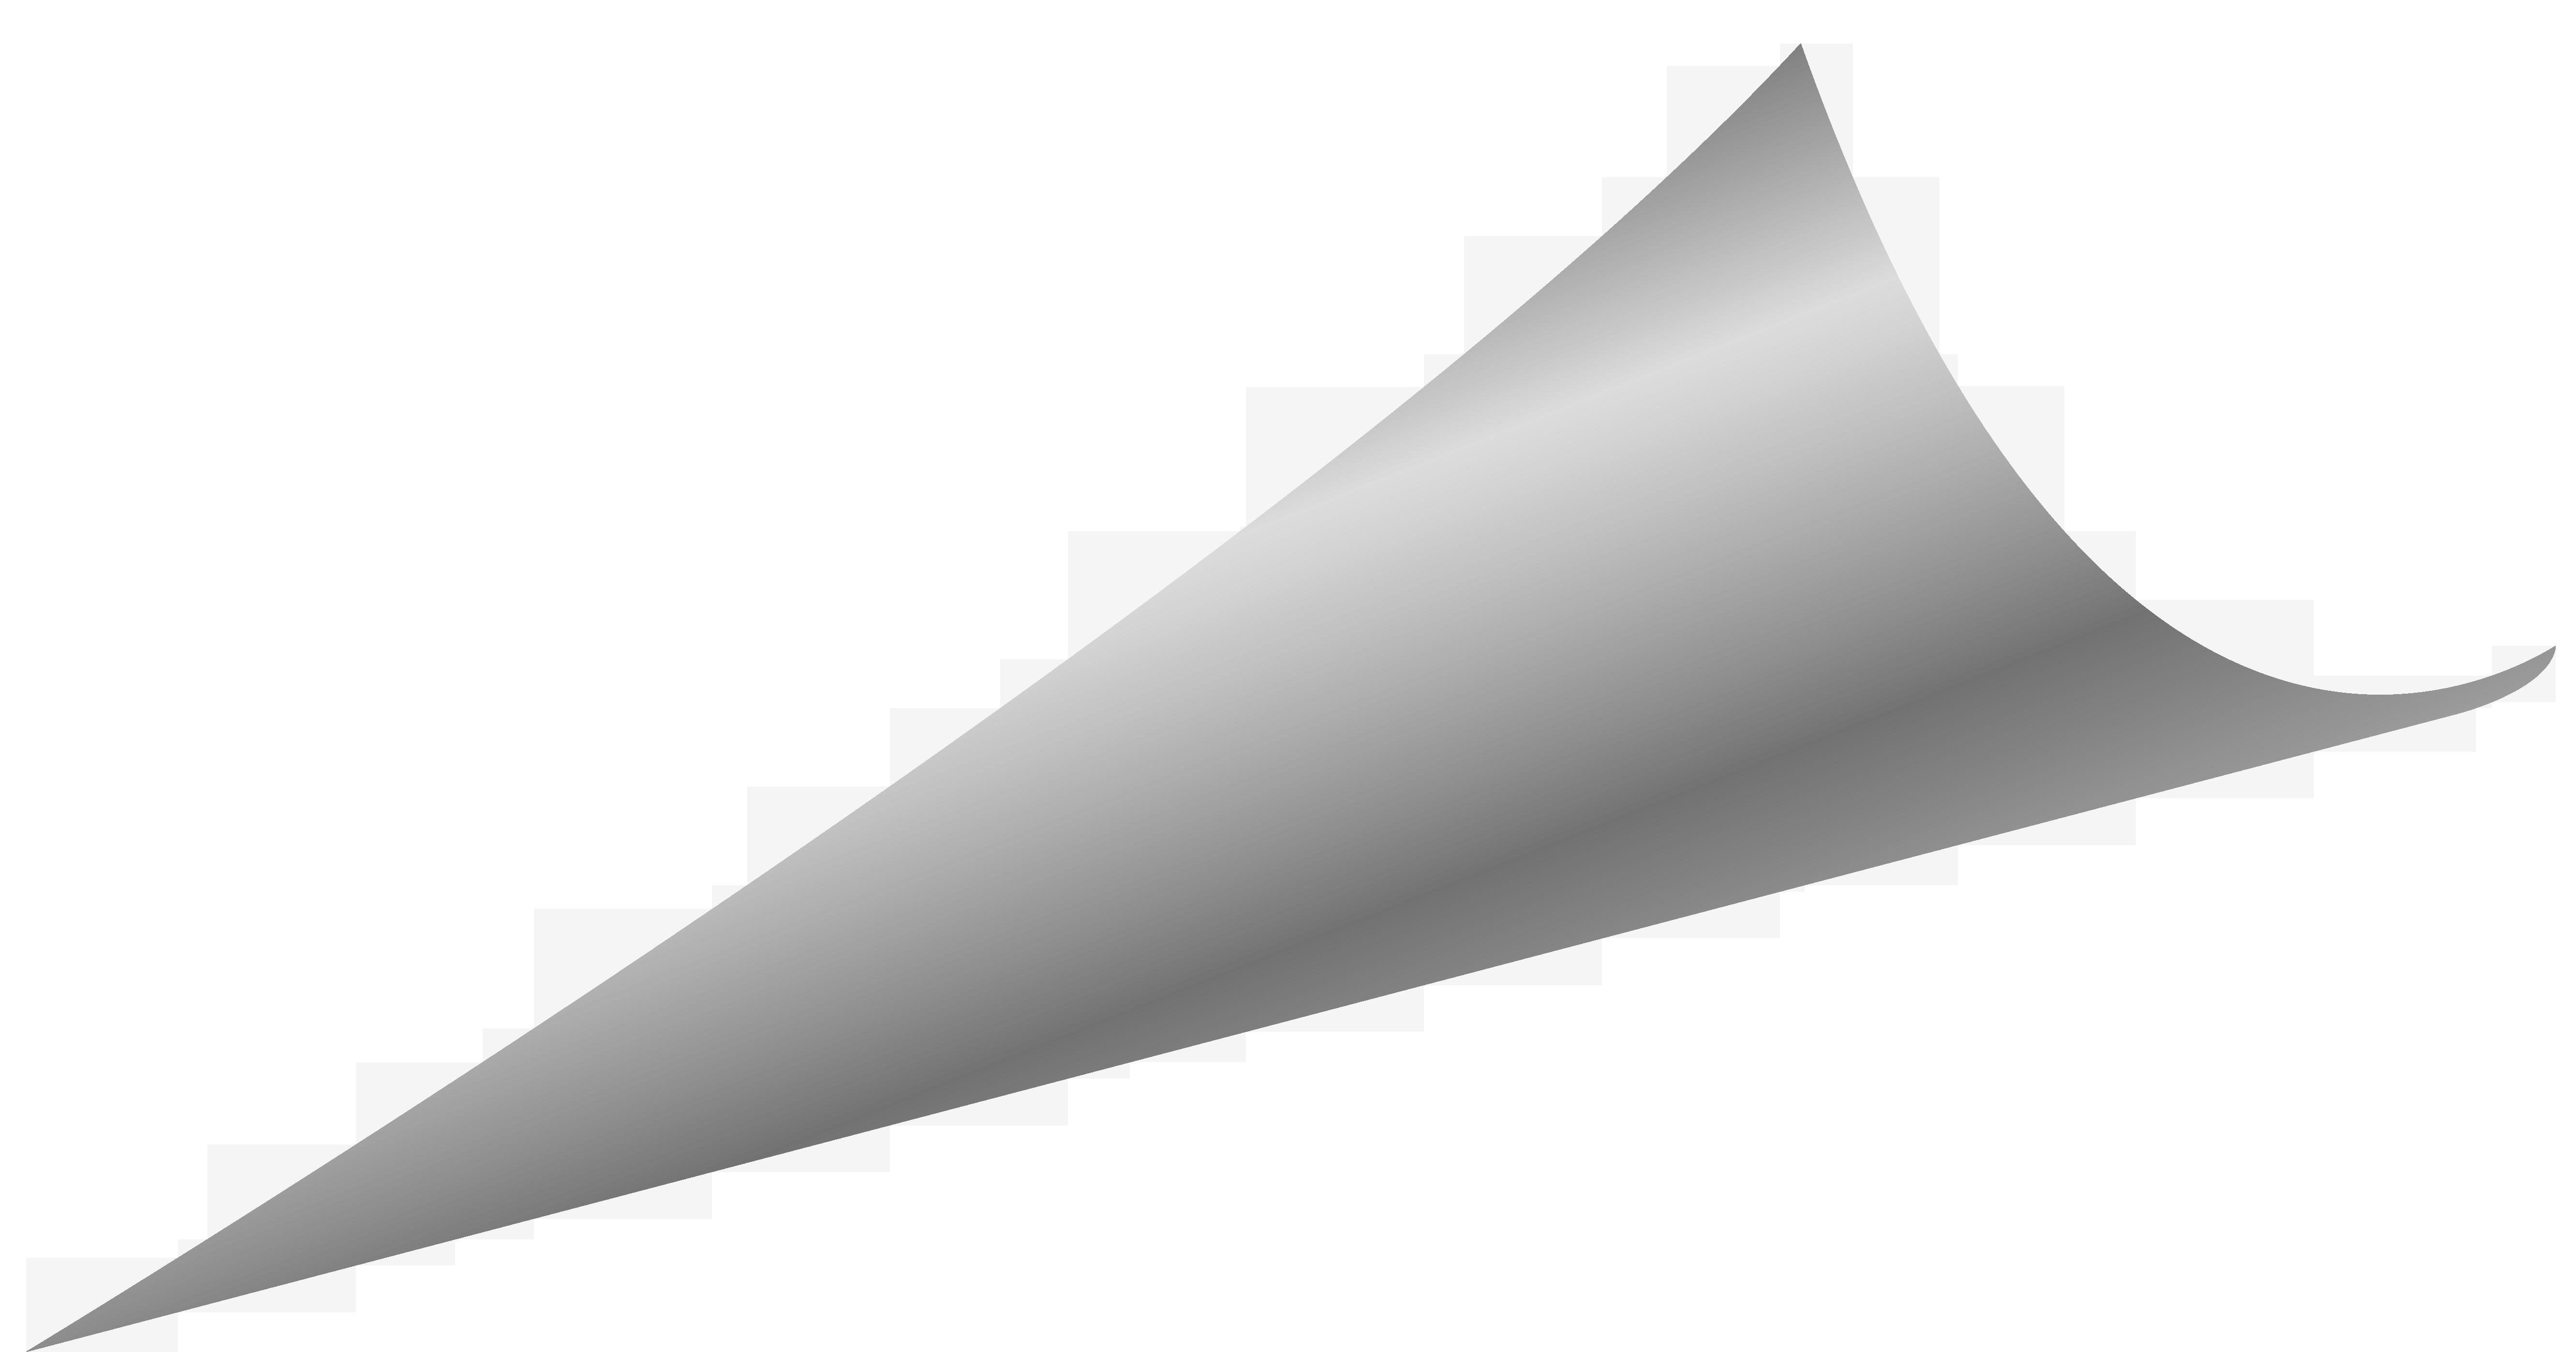 Silver Corner PNG Image